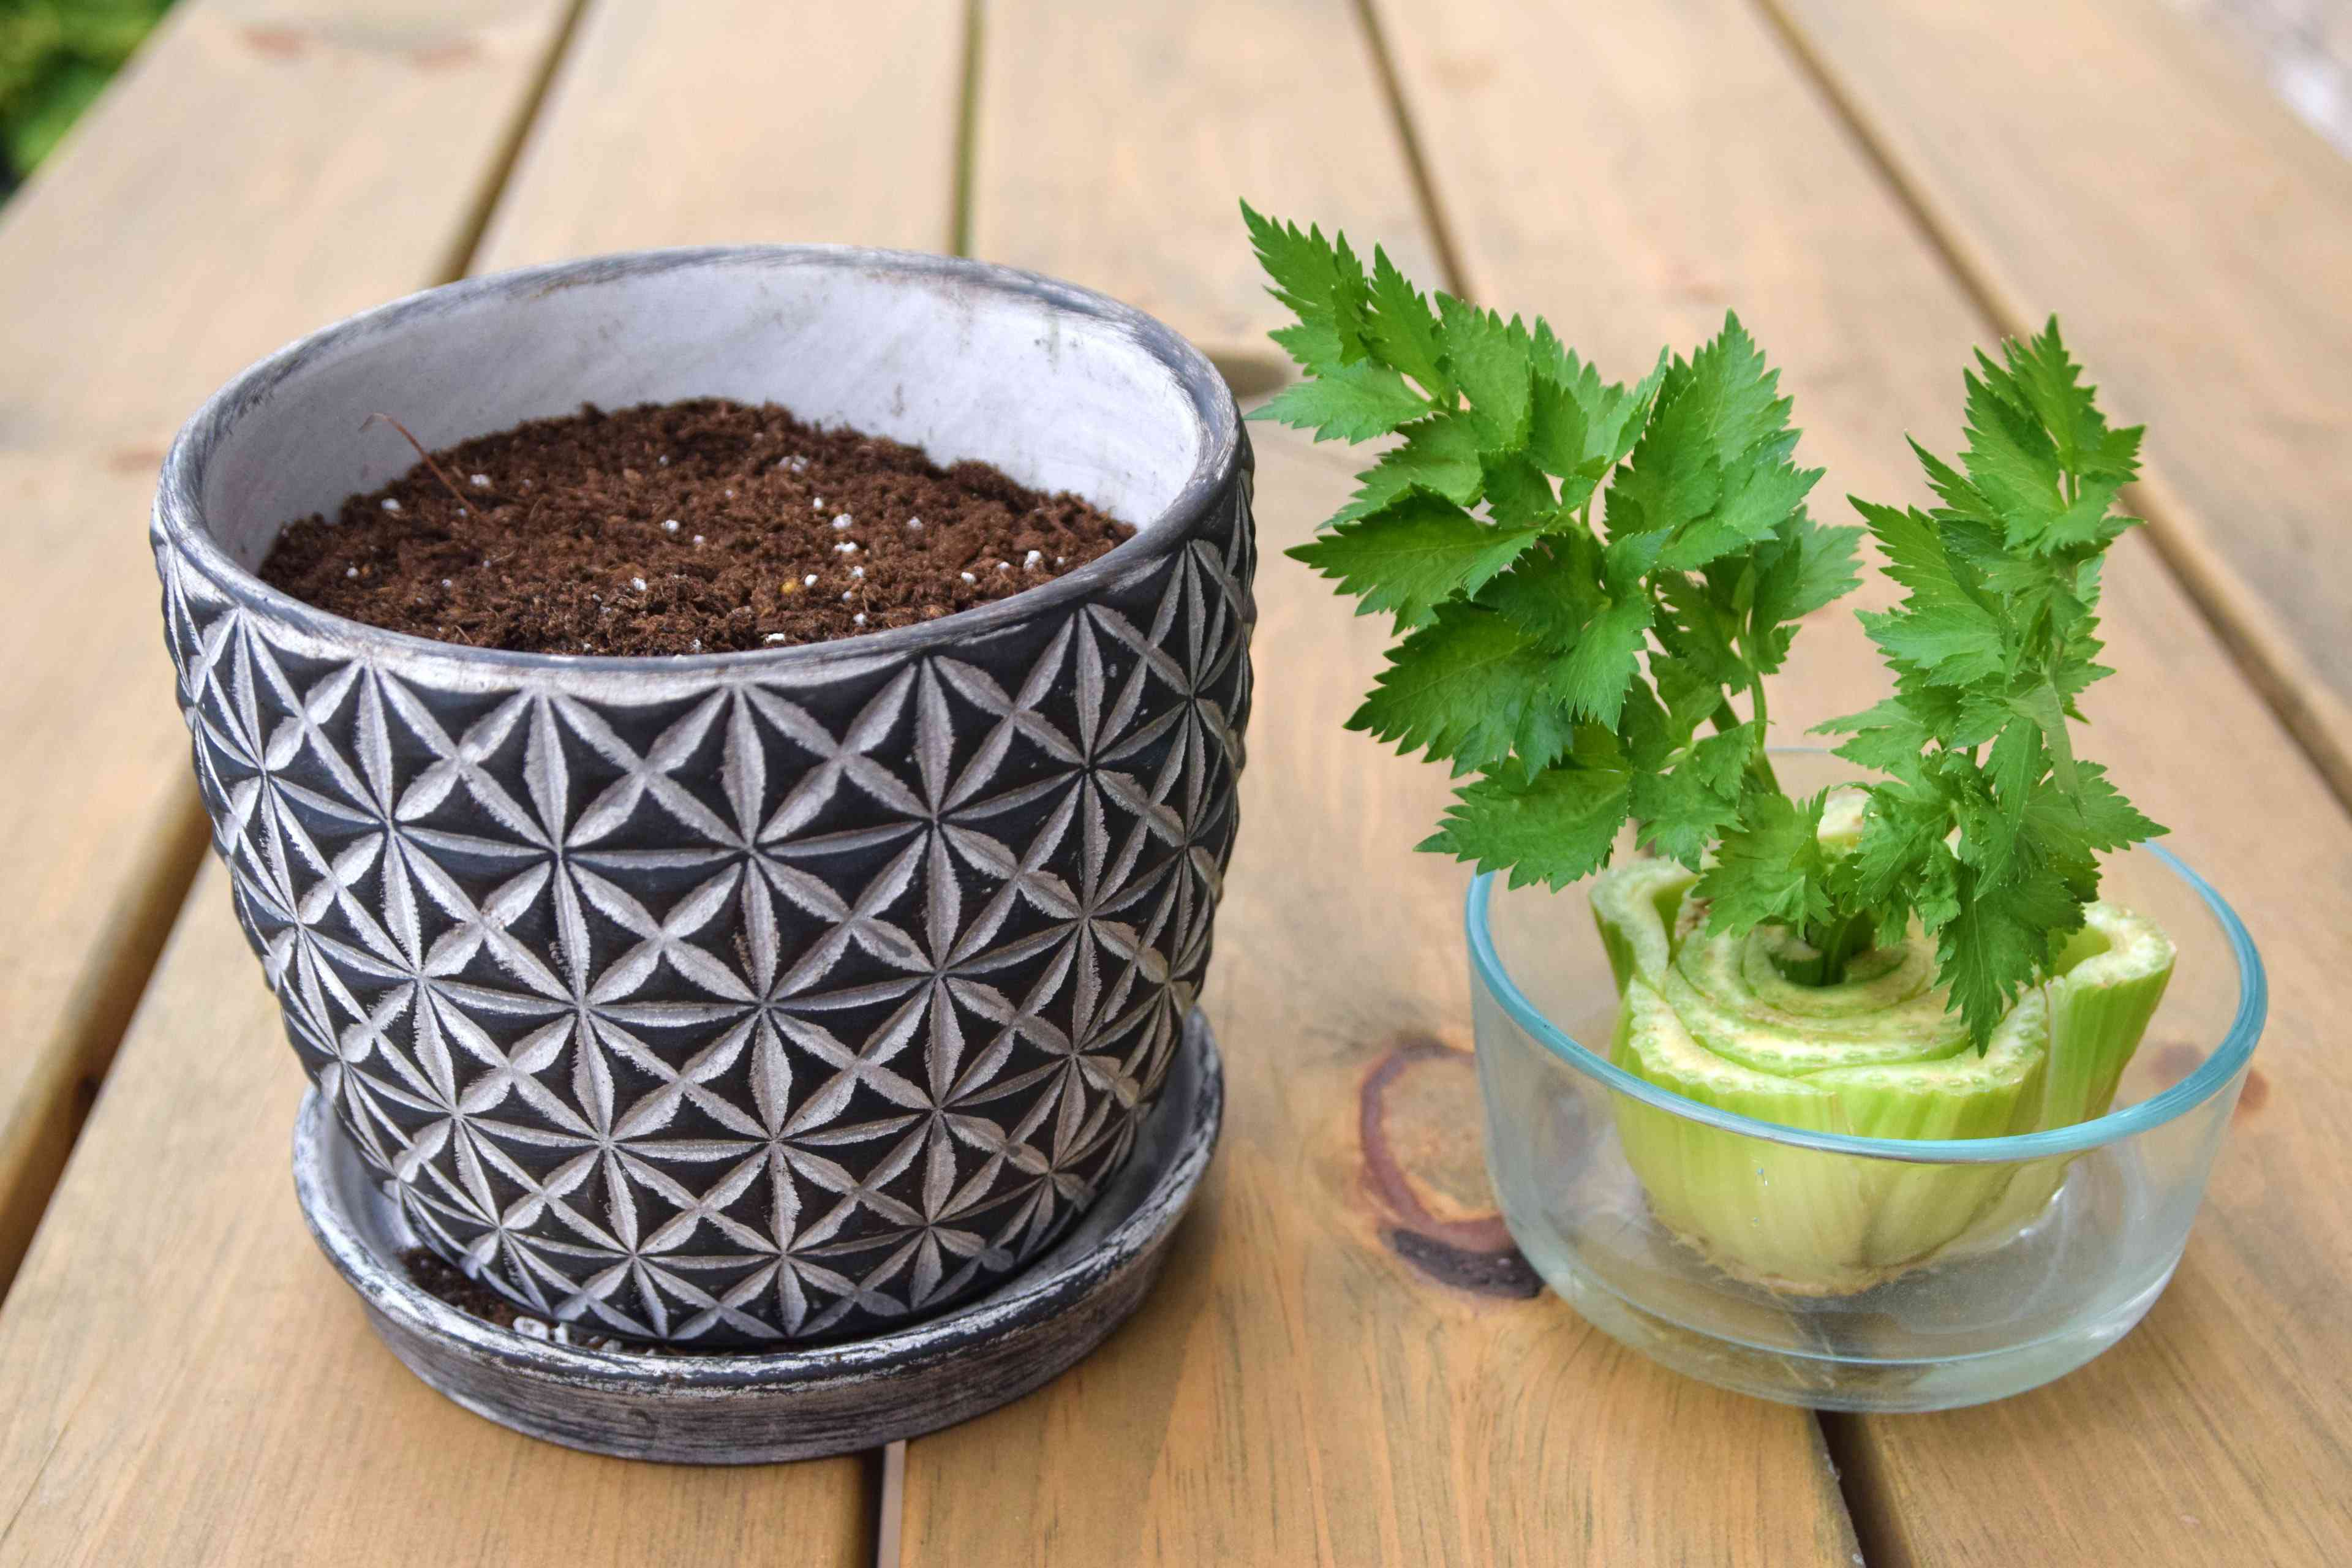 placing the celery into a pot